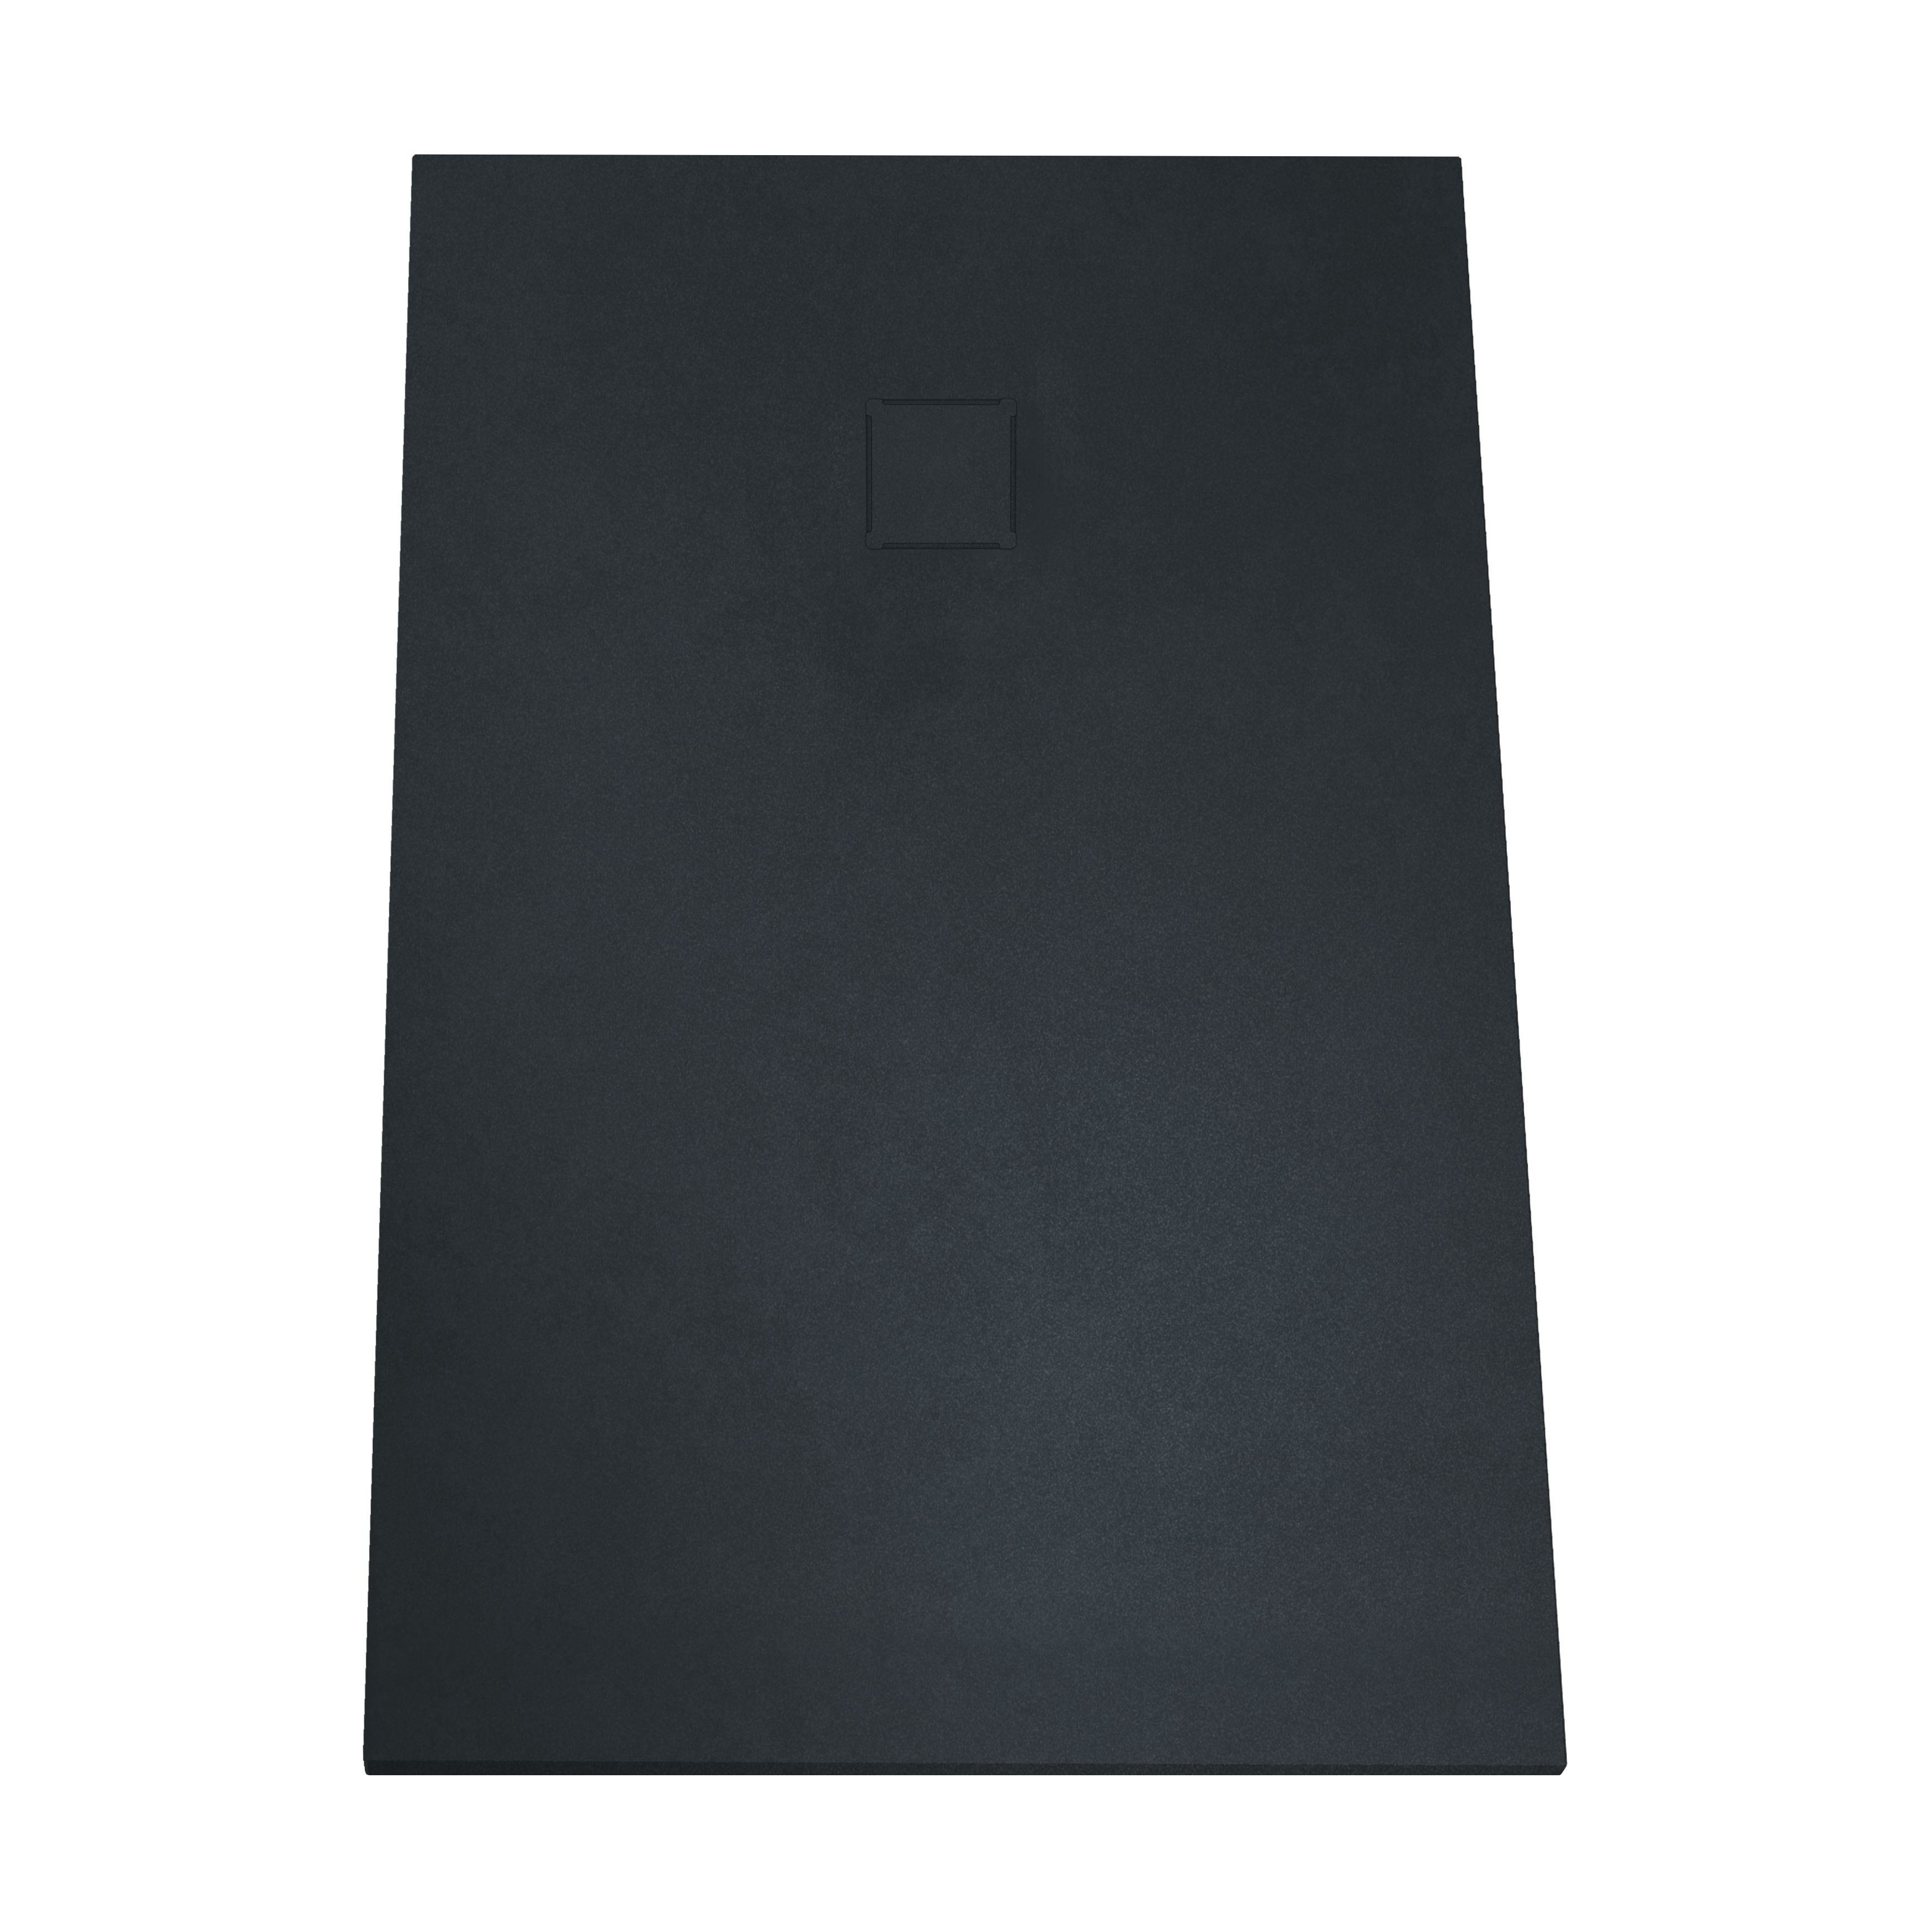 V-stone, receveur ultra plat en solid stone, 140  x  90 cm, anthraciteacite